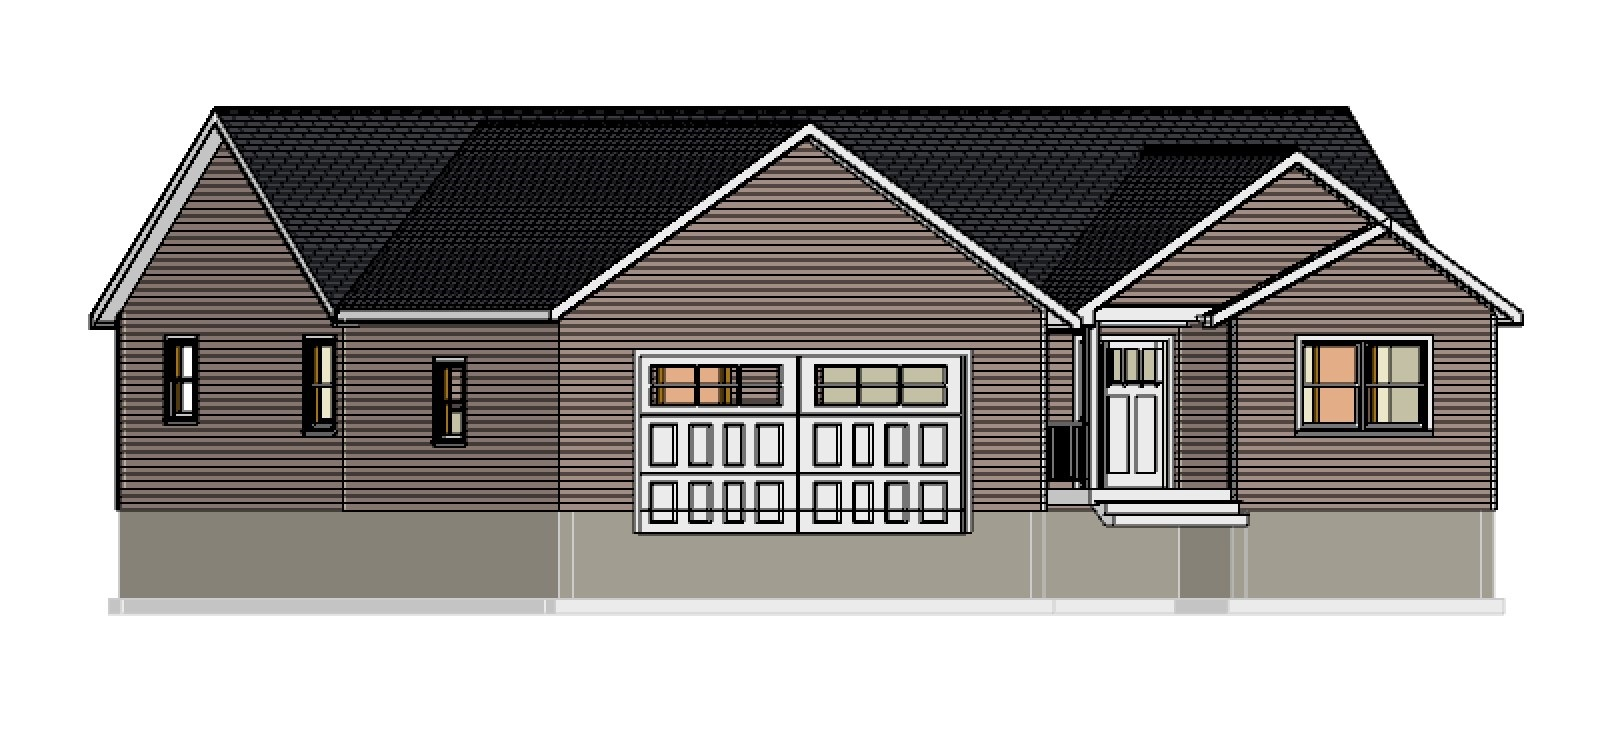 263 Fletcher Road, FAIRFAX, Vermont 05454, 3 Bedrooms Bedrooms, ,3 BathroomsBathrooms,Single Family,For Sale,263 Fletcher Road,1,4851113